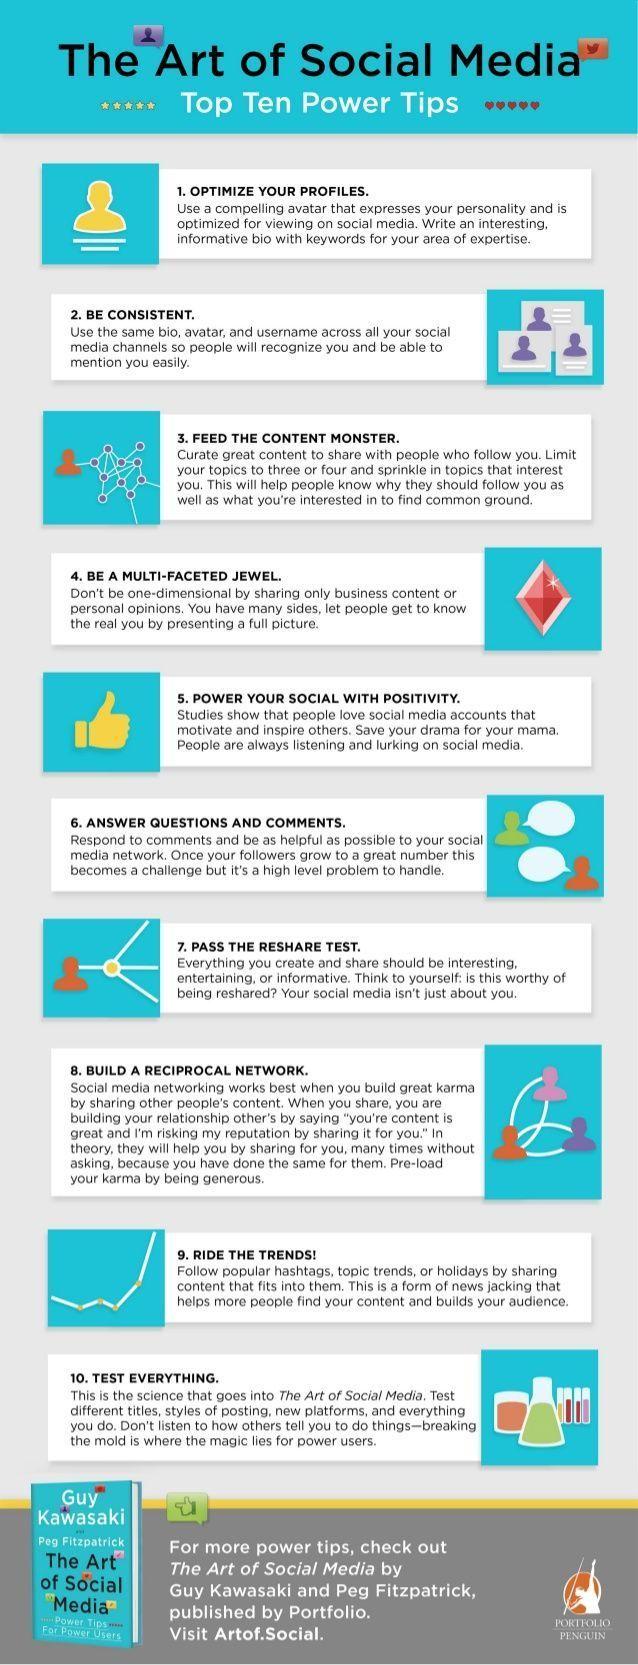 The Art of Social Media Infographic by Guy Kawasaki via slideshare